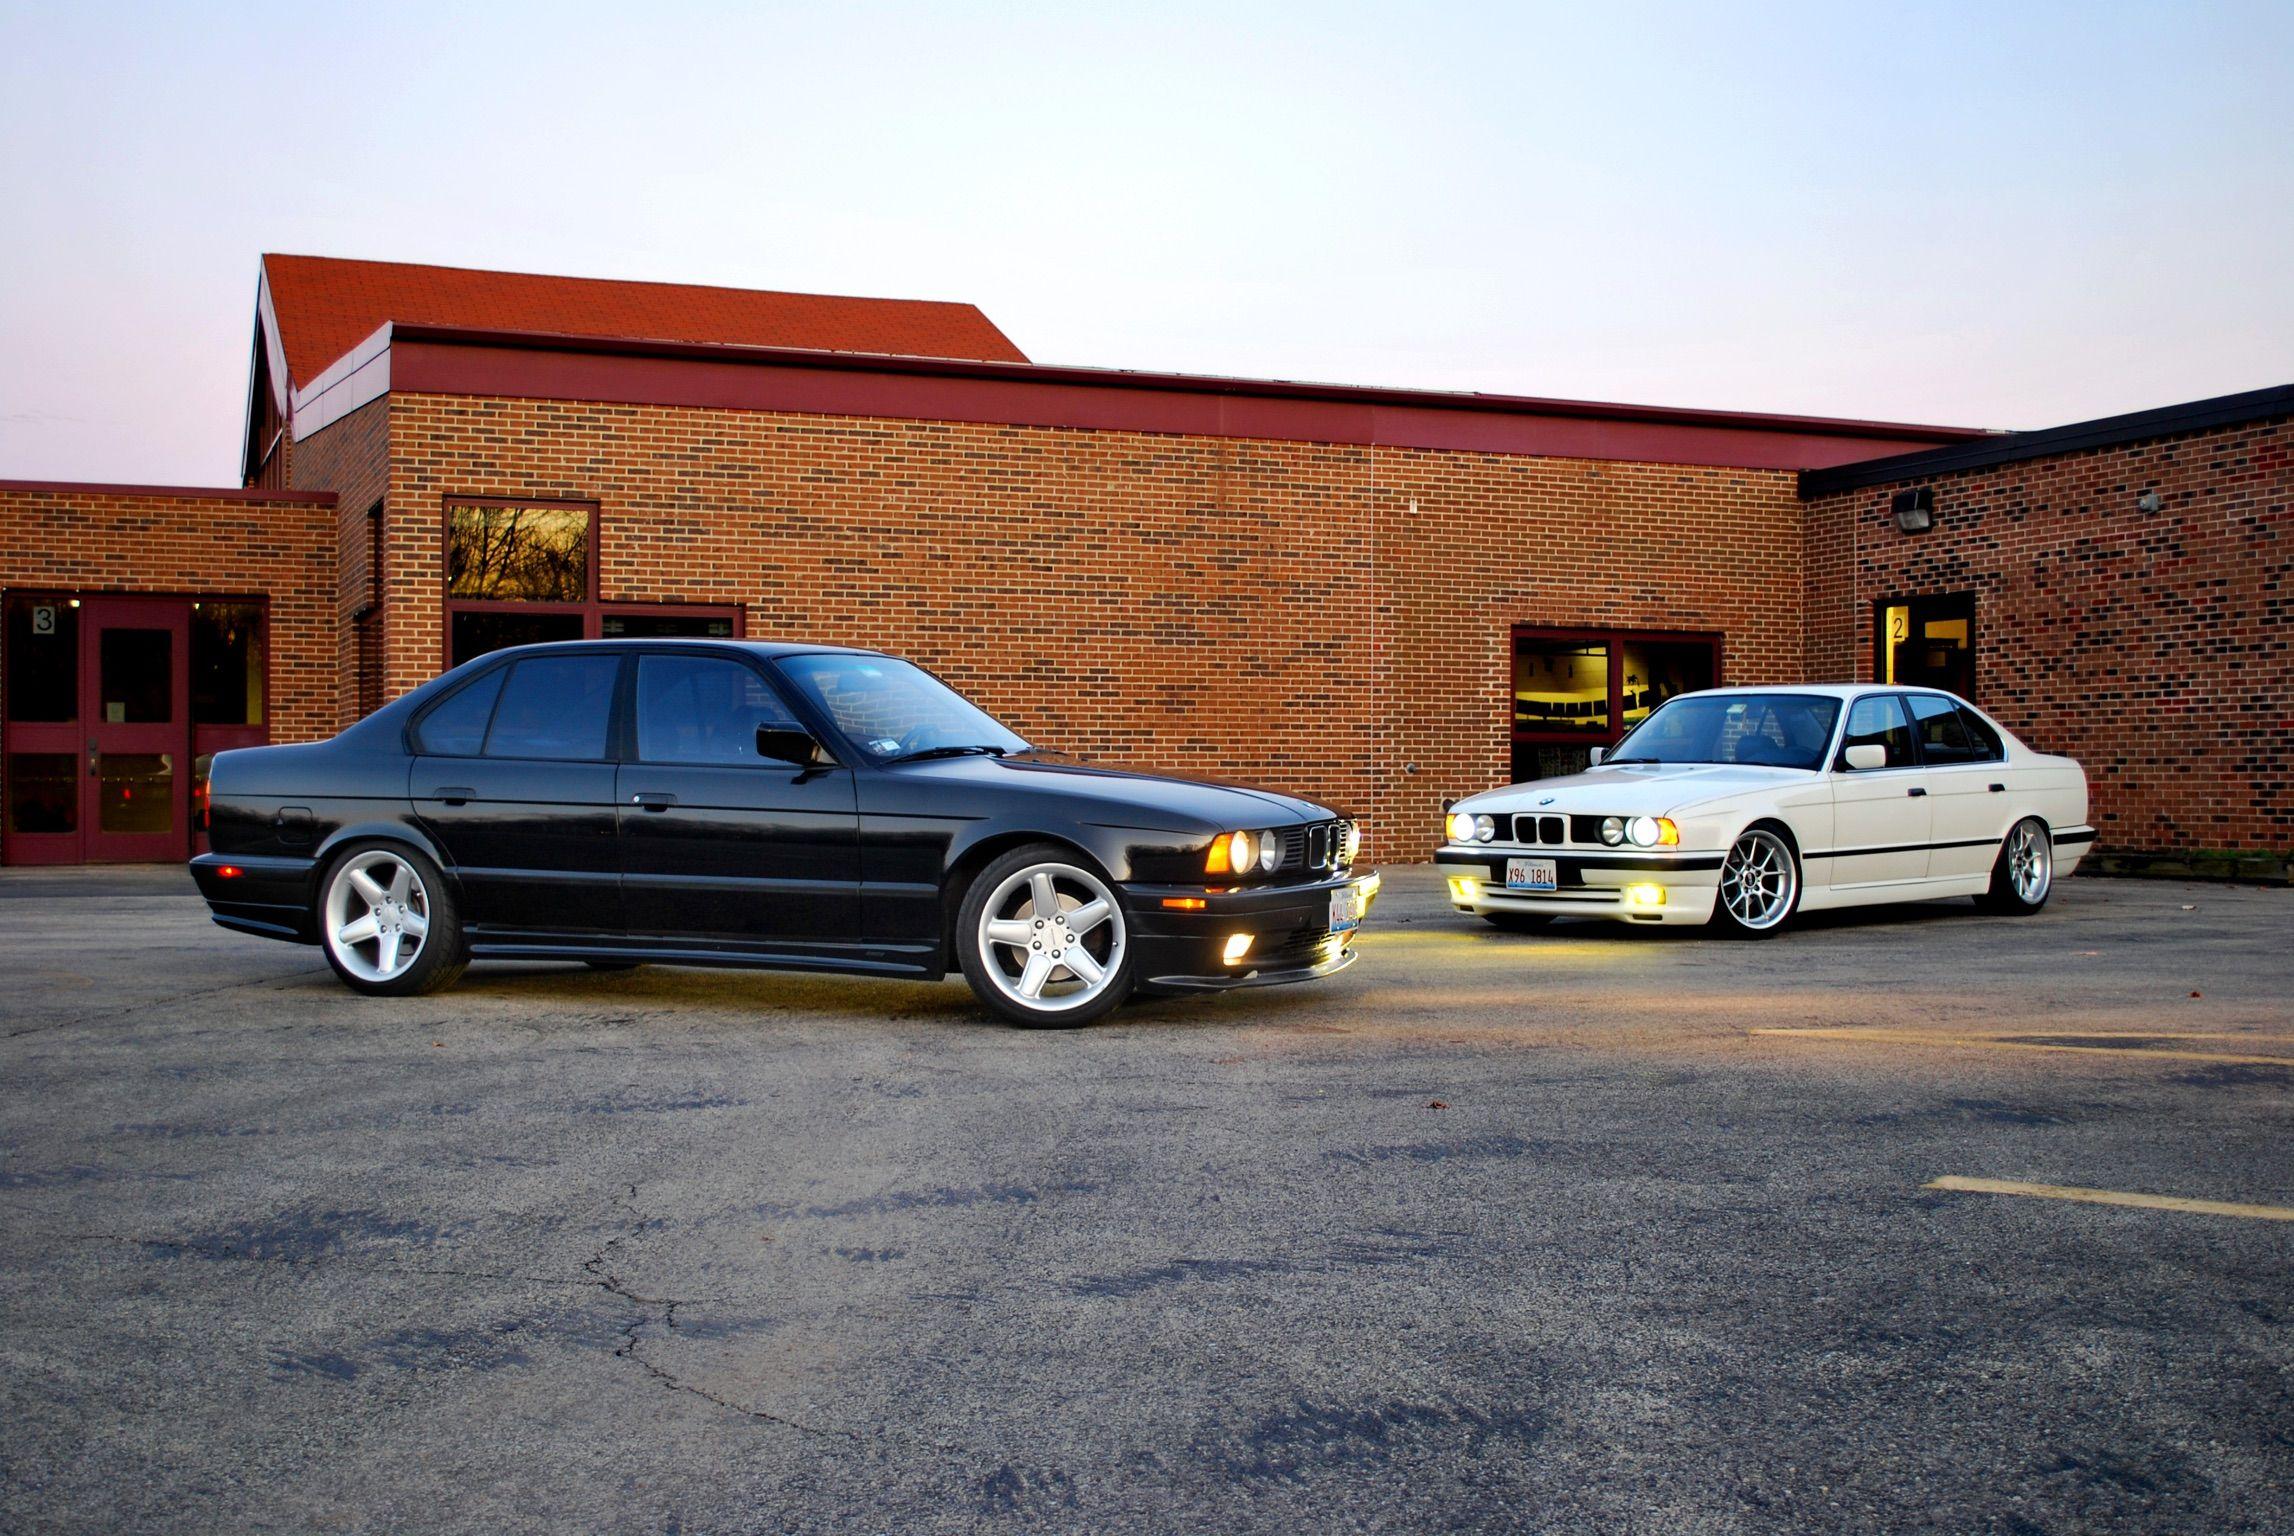 Black Bmw E34 With Zender Kit Ac Schnitzer Wheels White E34